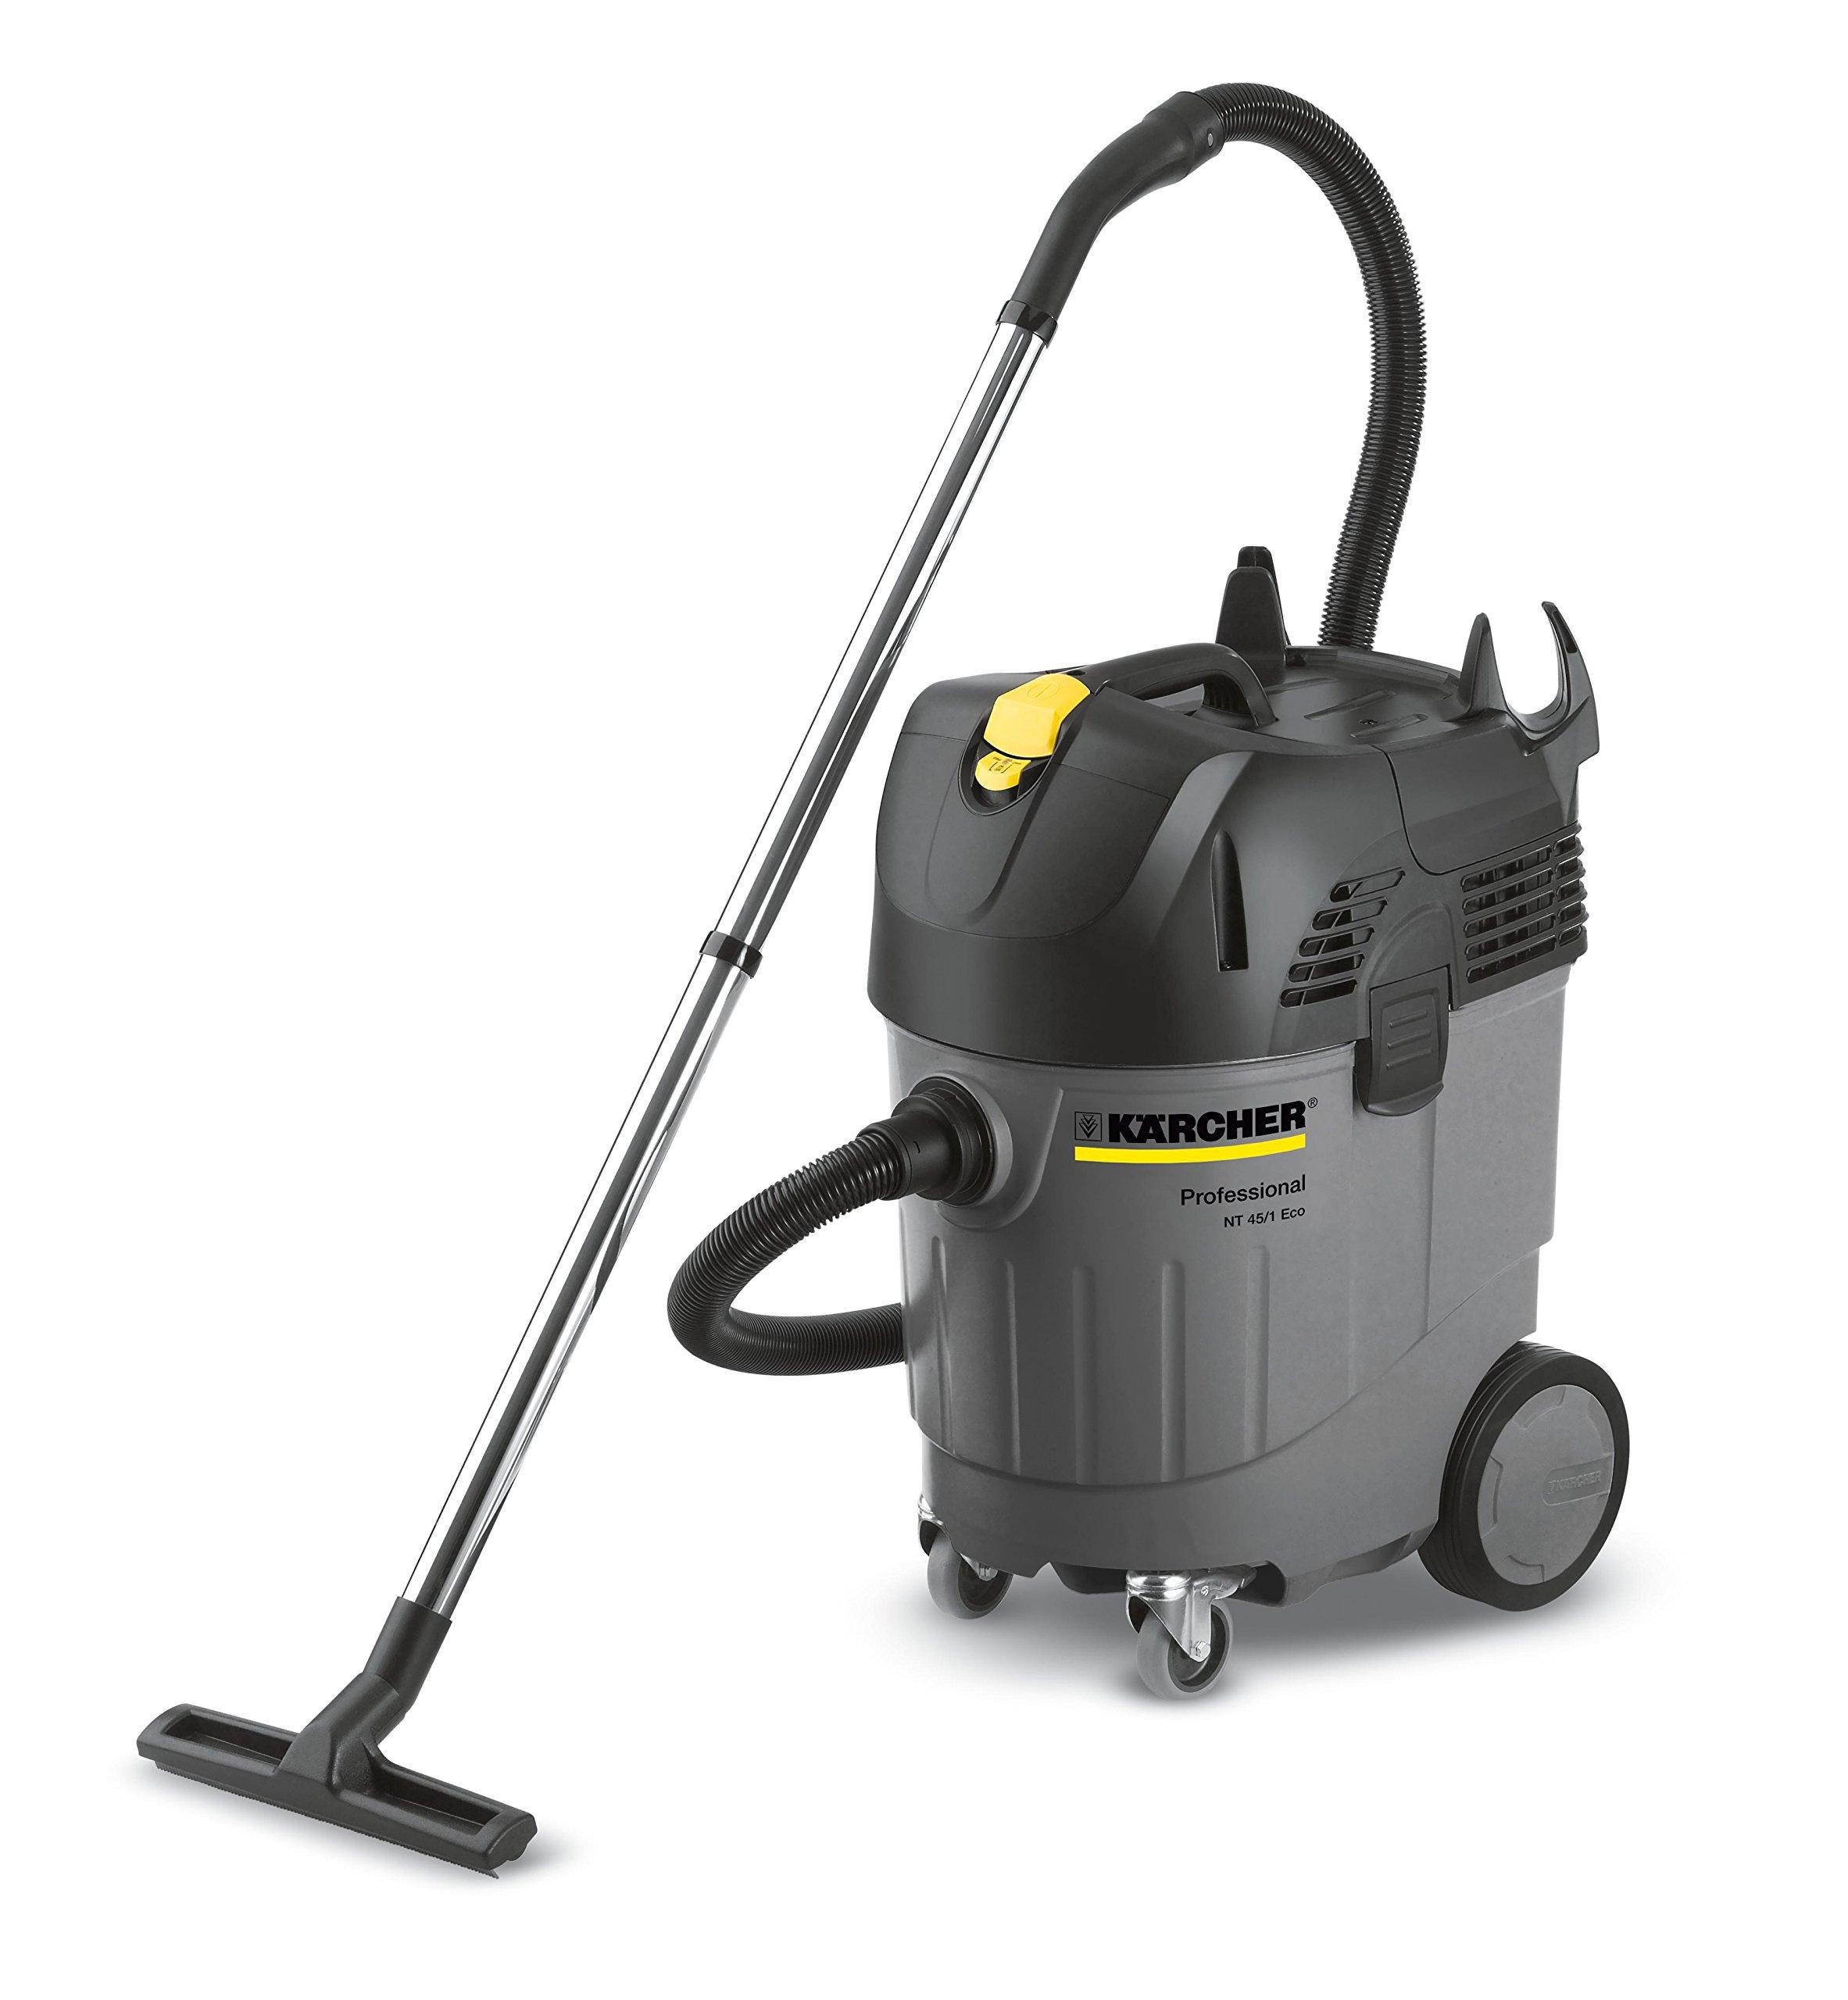 Karcher NT 45/1 Tact Professional Shop Wet Dry Vacuum, 1.85 HP, 10 gallon Dry & 7.9 Gallon Wet Capacity